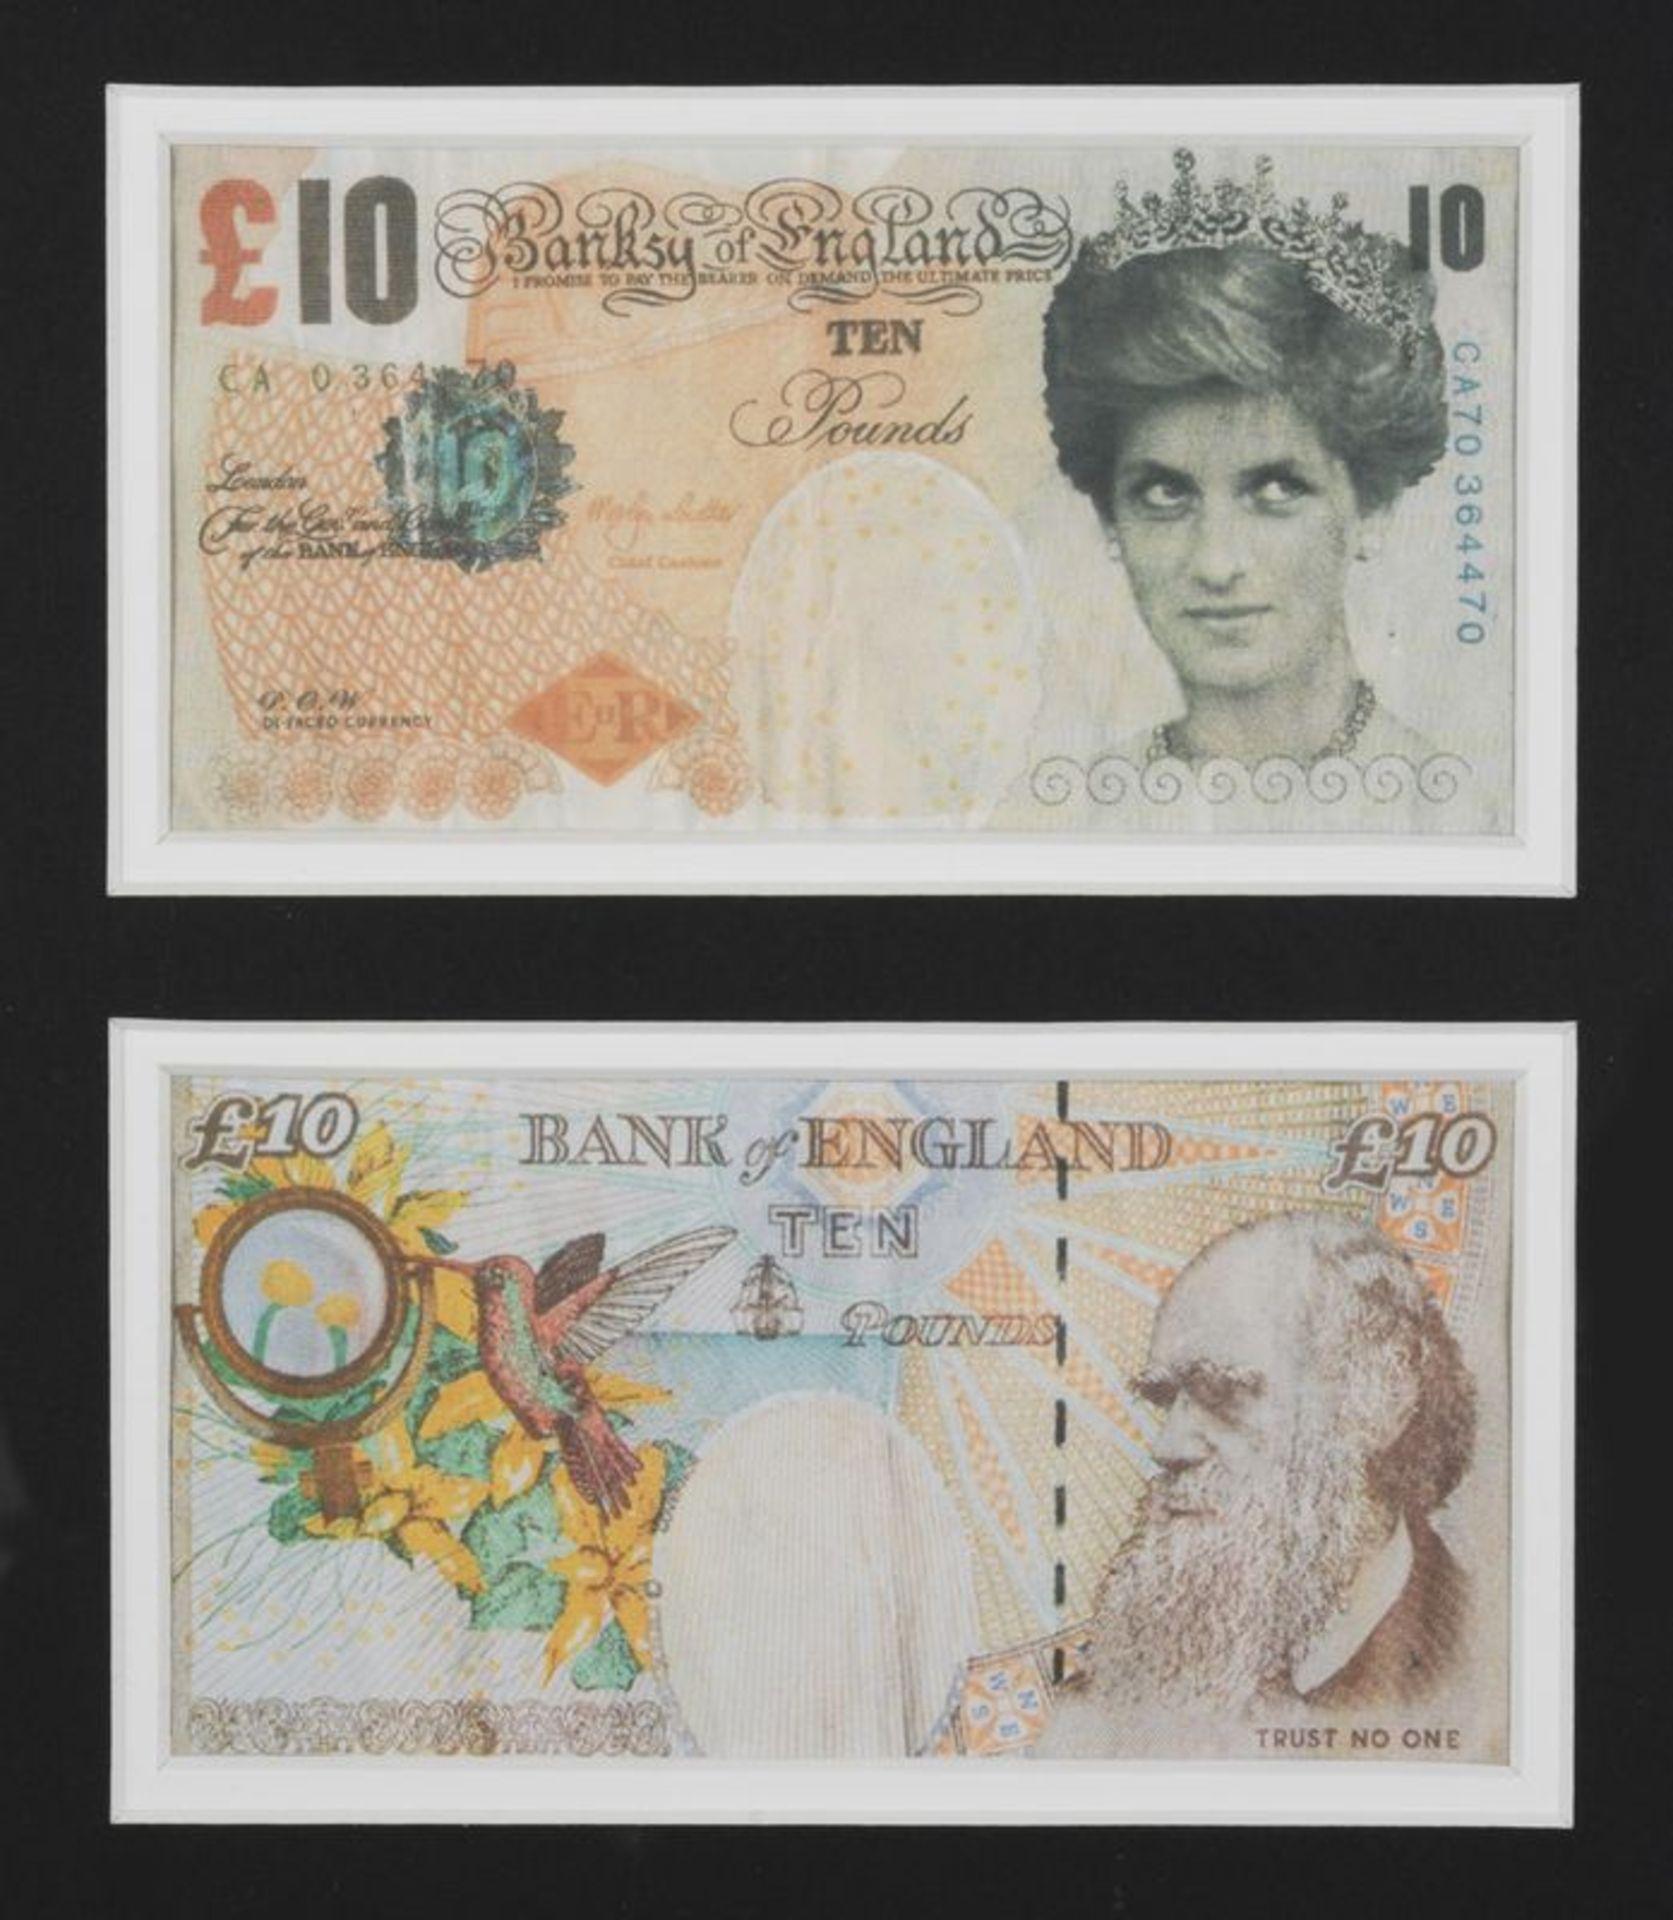 Los 8 - BANKSY (1974) - Difaced tanner £10, 2004- Offset lithographie sur papier 7,6 x 14,4 [...]